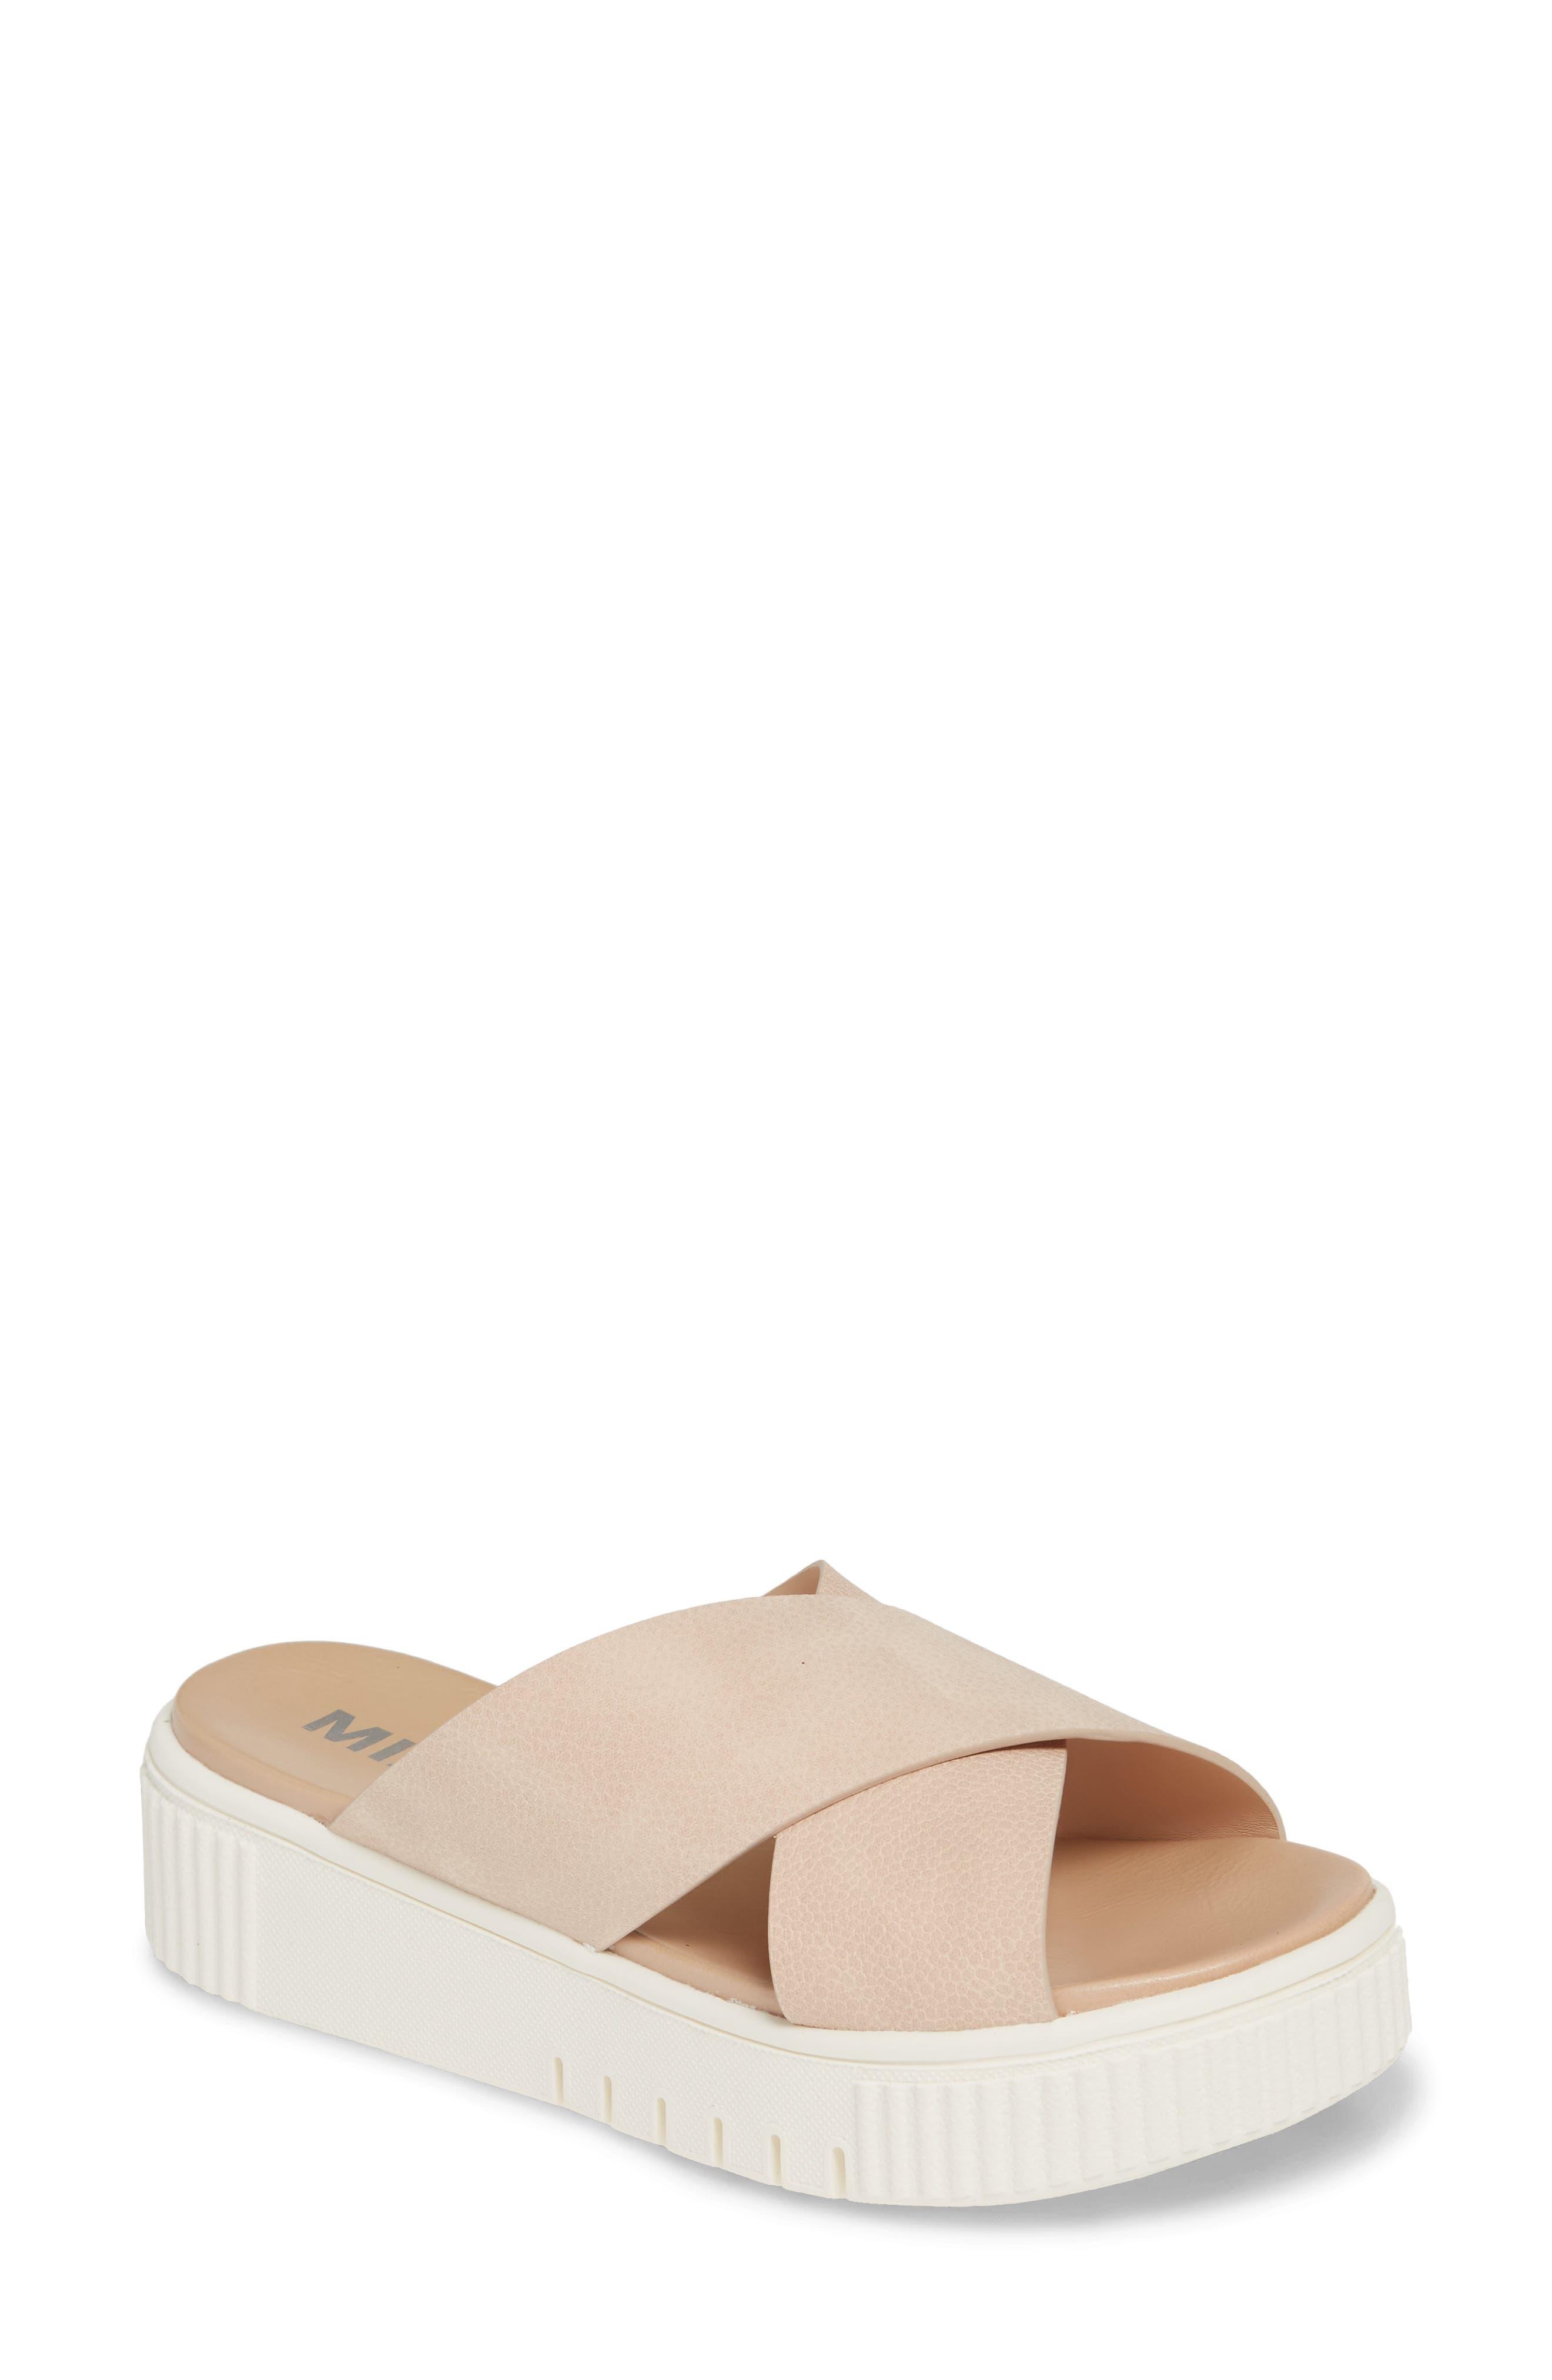 25376d573111 Mia Lia Platform Sandal